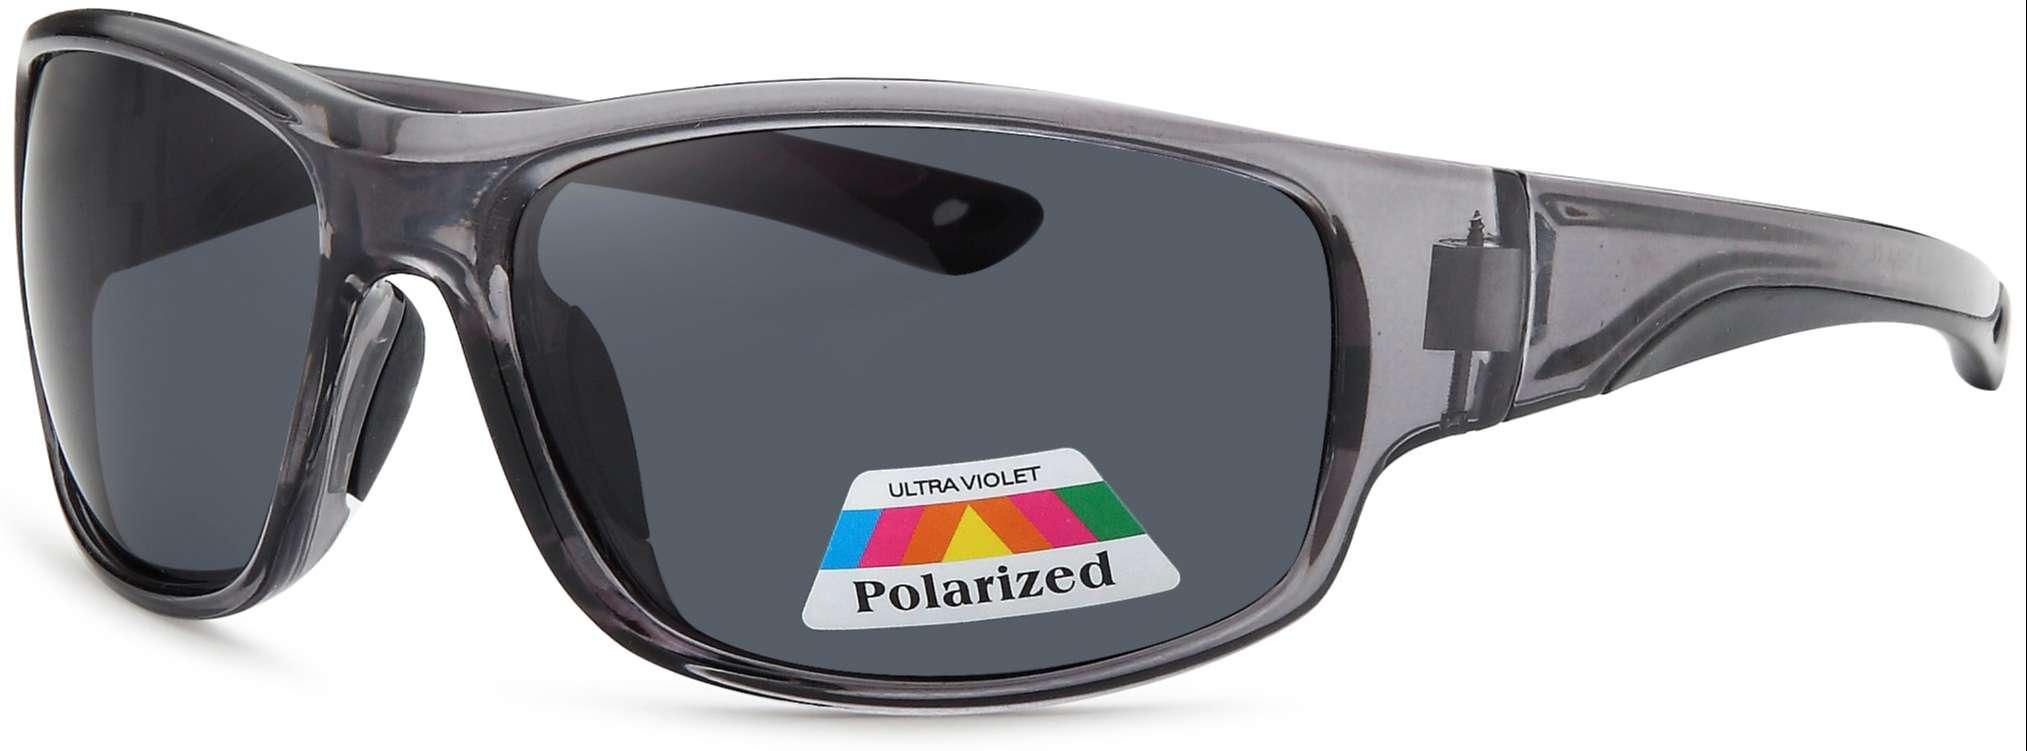 Gray frame smoke lens polarized